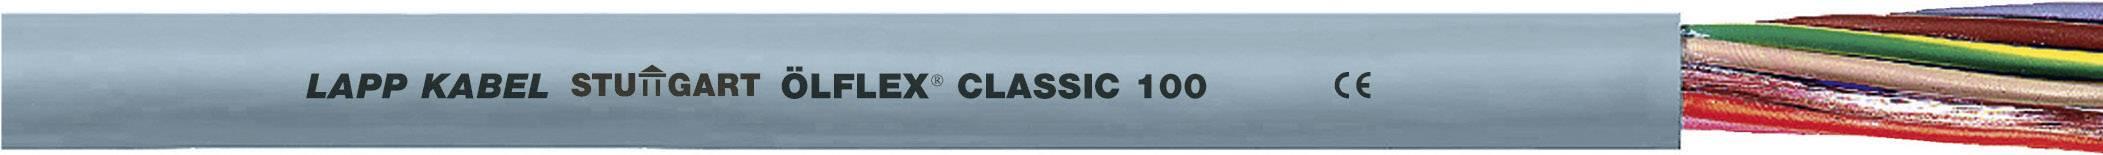 Kabel LappKabel Ölflex CLASSIC 100 21G0,75 (0010033), PVC, 13 mm, 500 V, šedá, 500 m